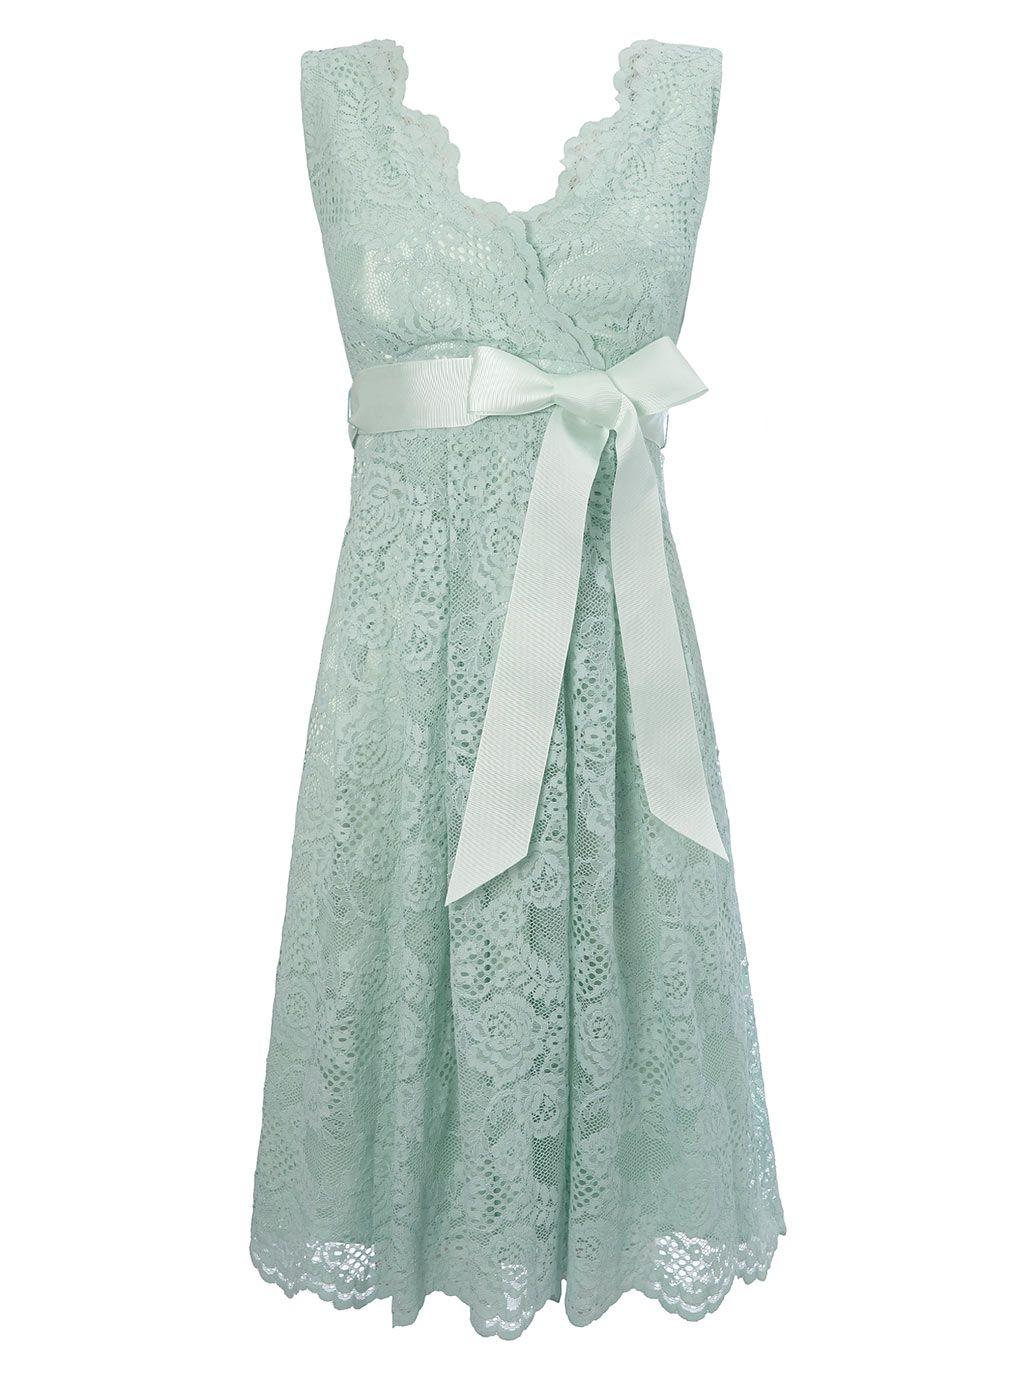 Sofia Mint Short Dress - BHS | Bridesmaid ideas | Pinterest | Short ...